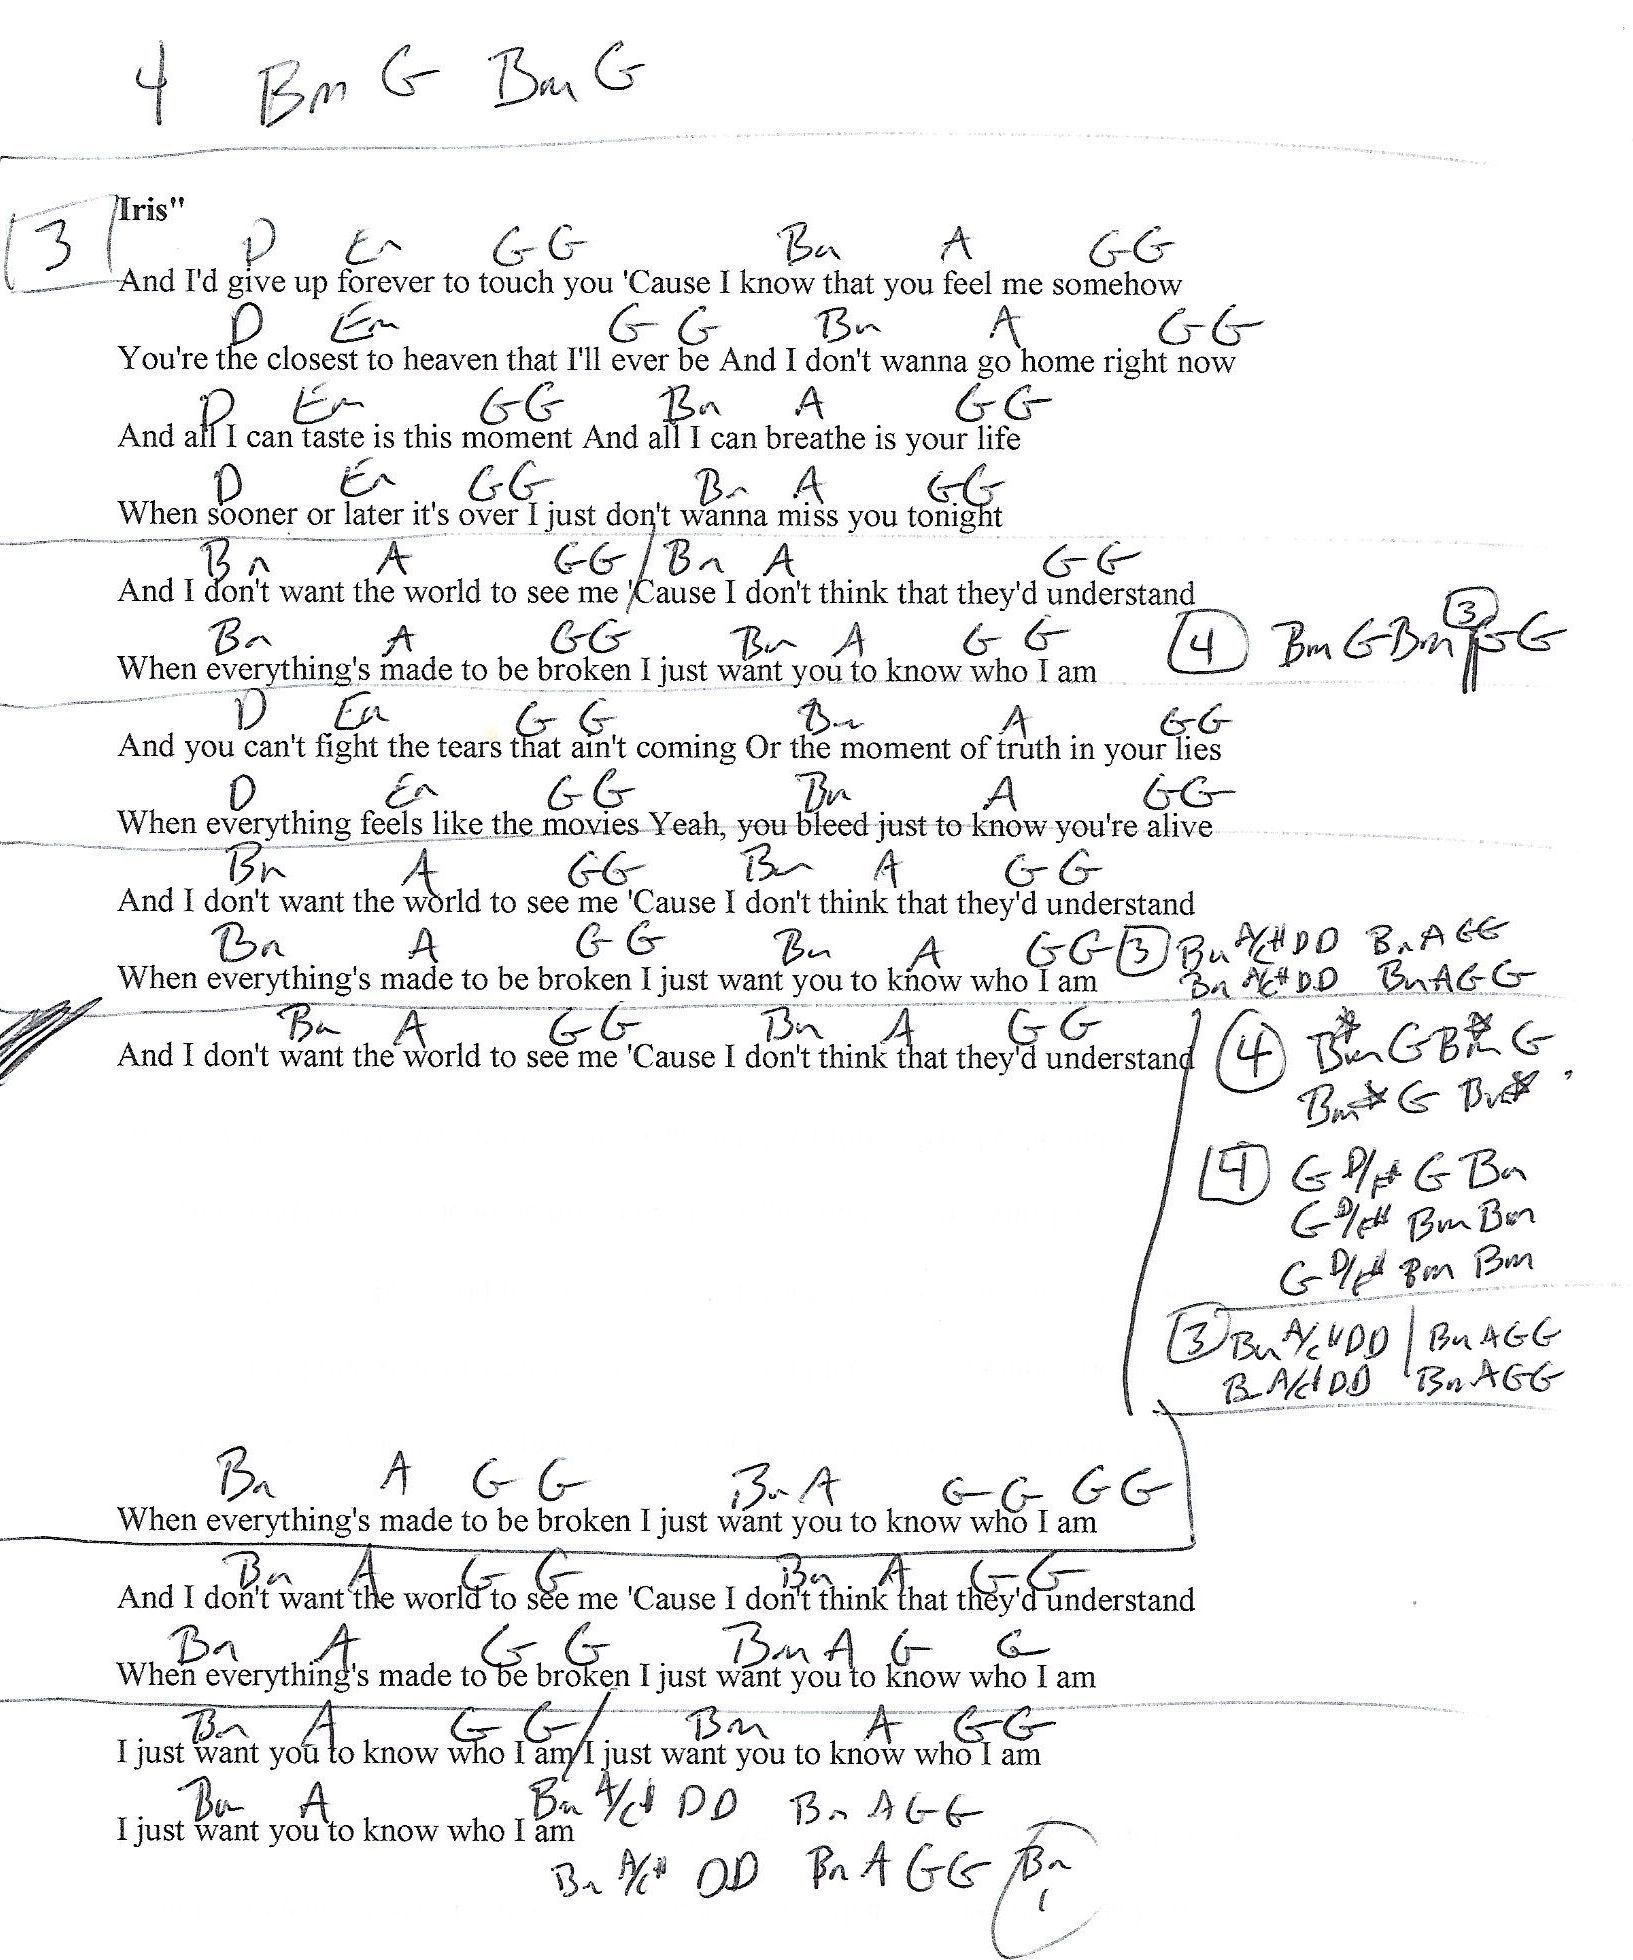 Iris Goo Goo Dolls Guitar Lesson Chord Chart With Lyrics Chords